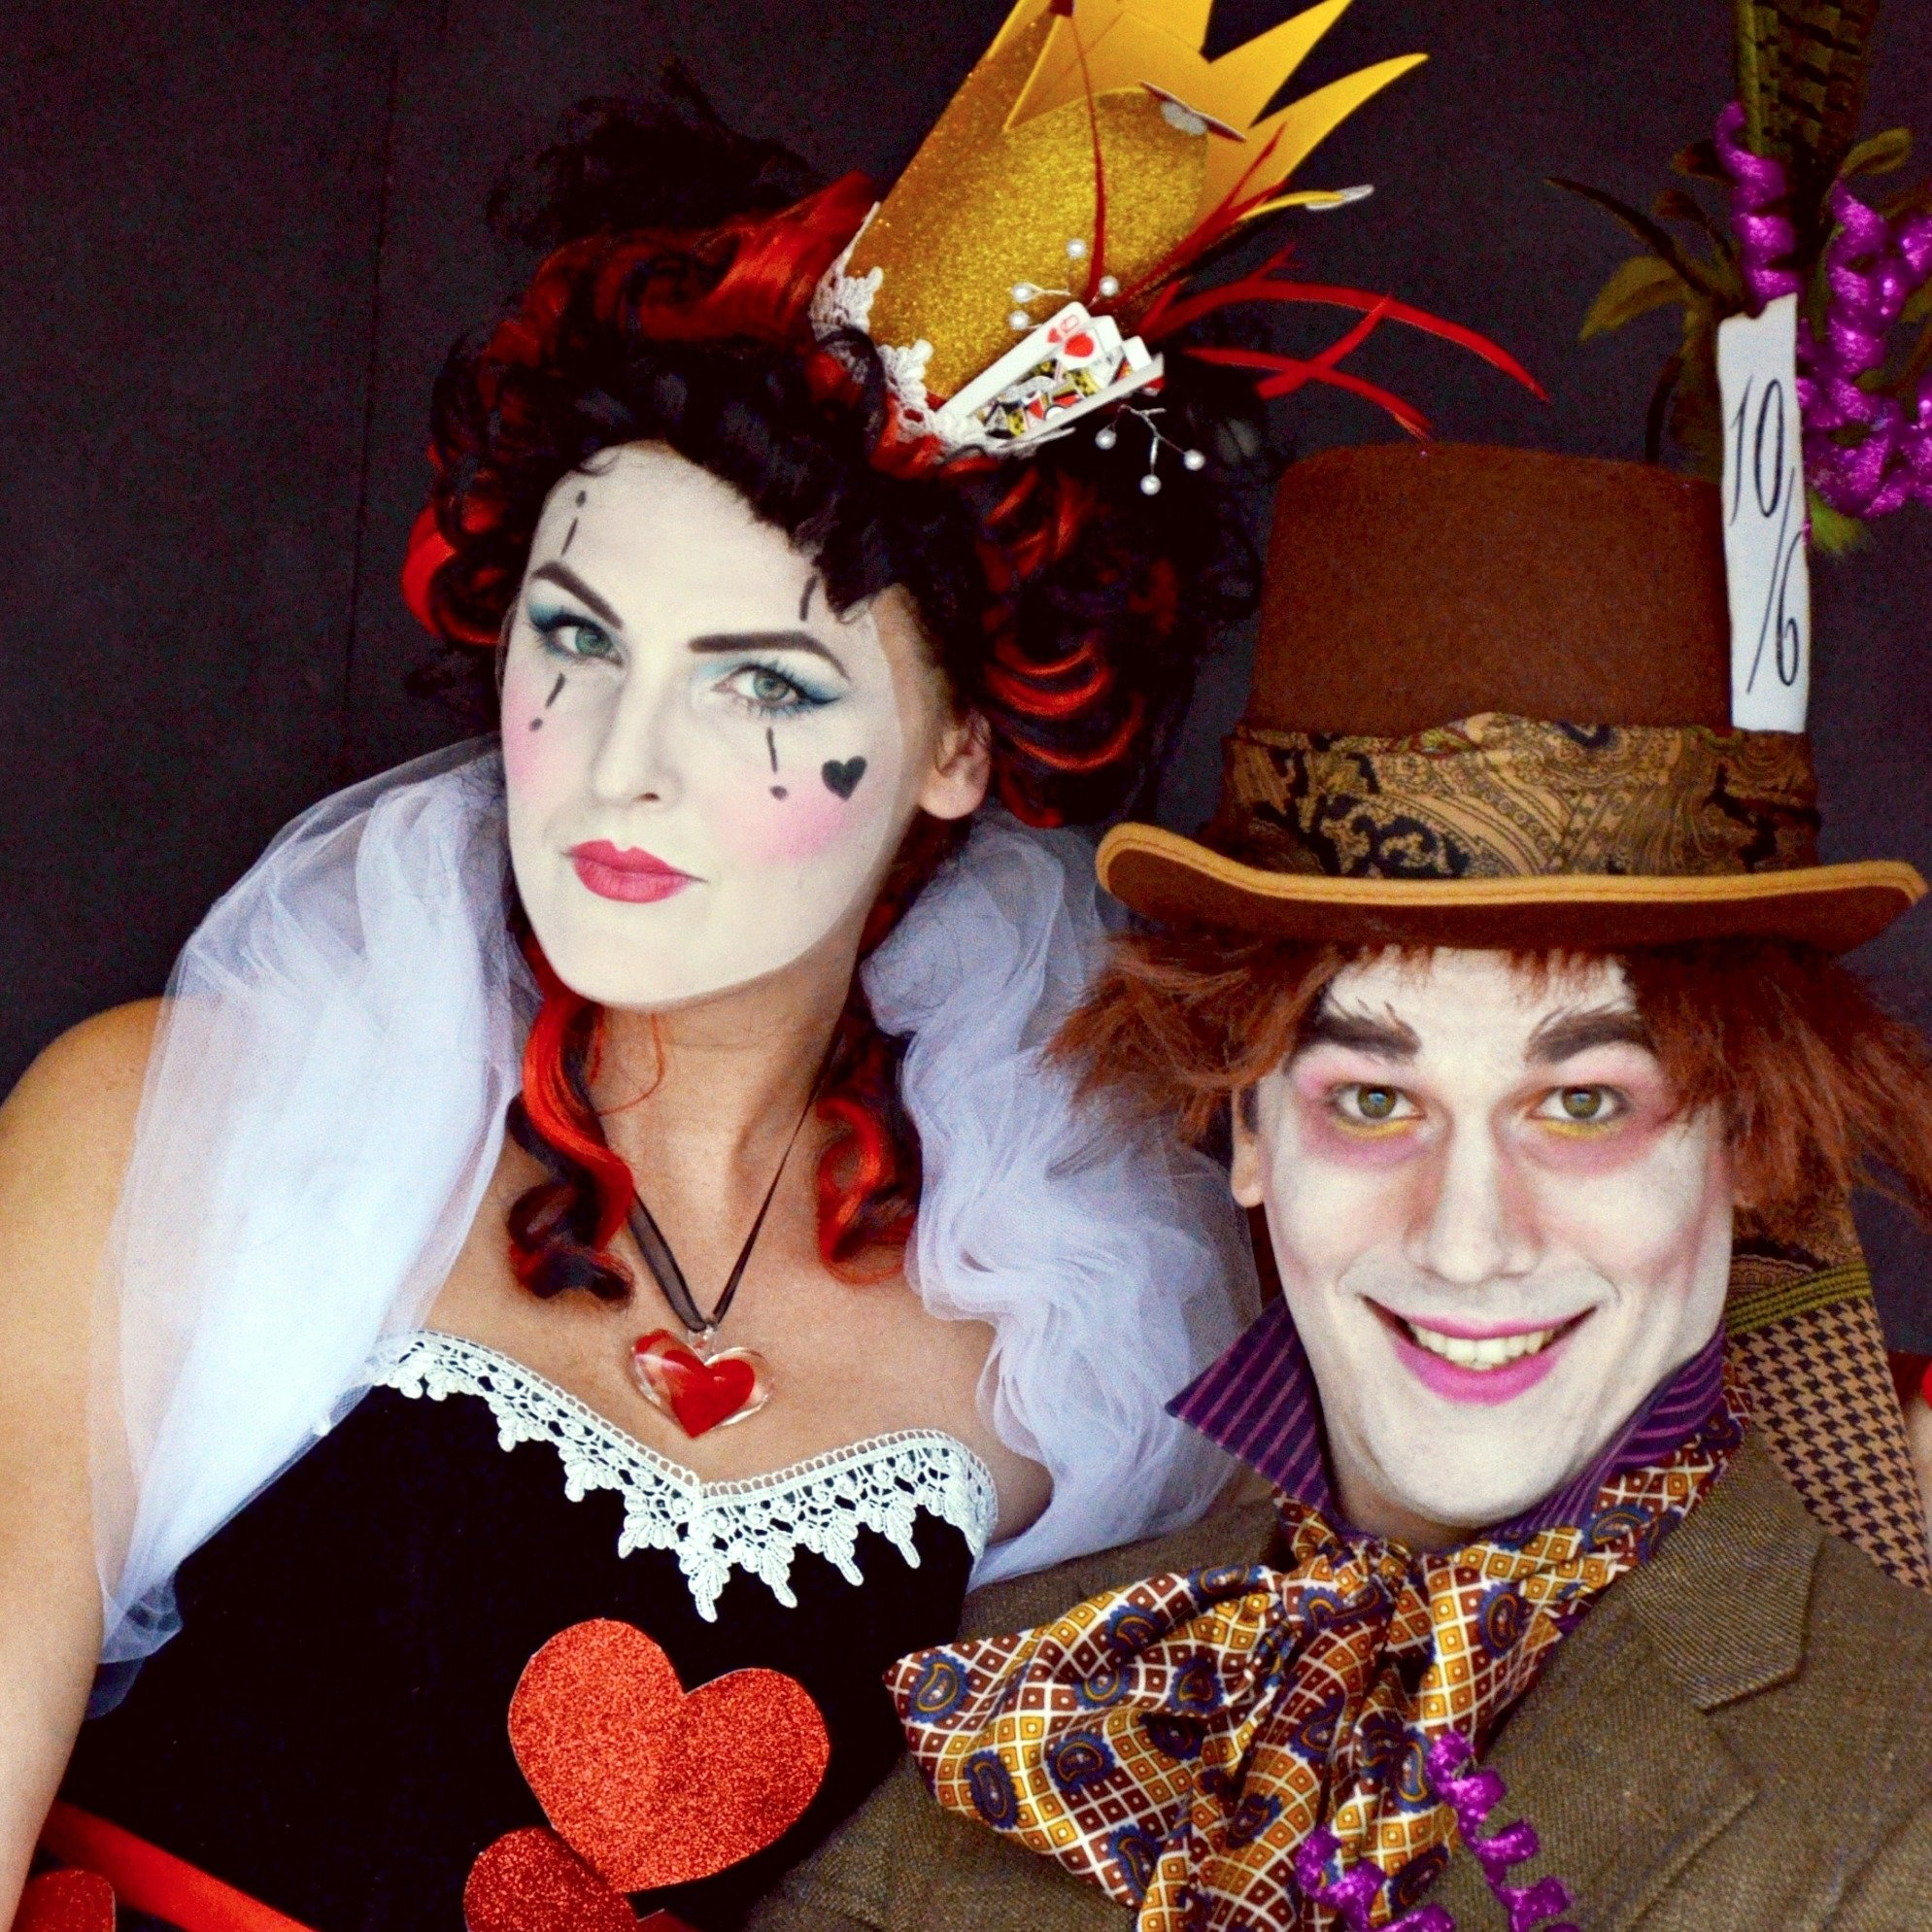 10 Trendy Queen Of Hearts Makeup Ideas mad hatter and queen of heartscouples halloween costume ideas